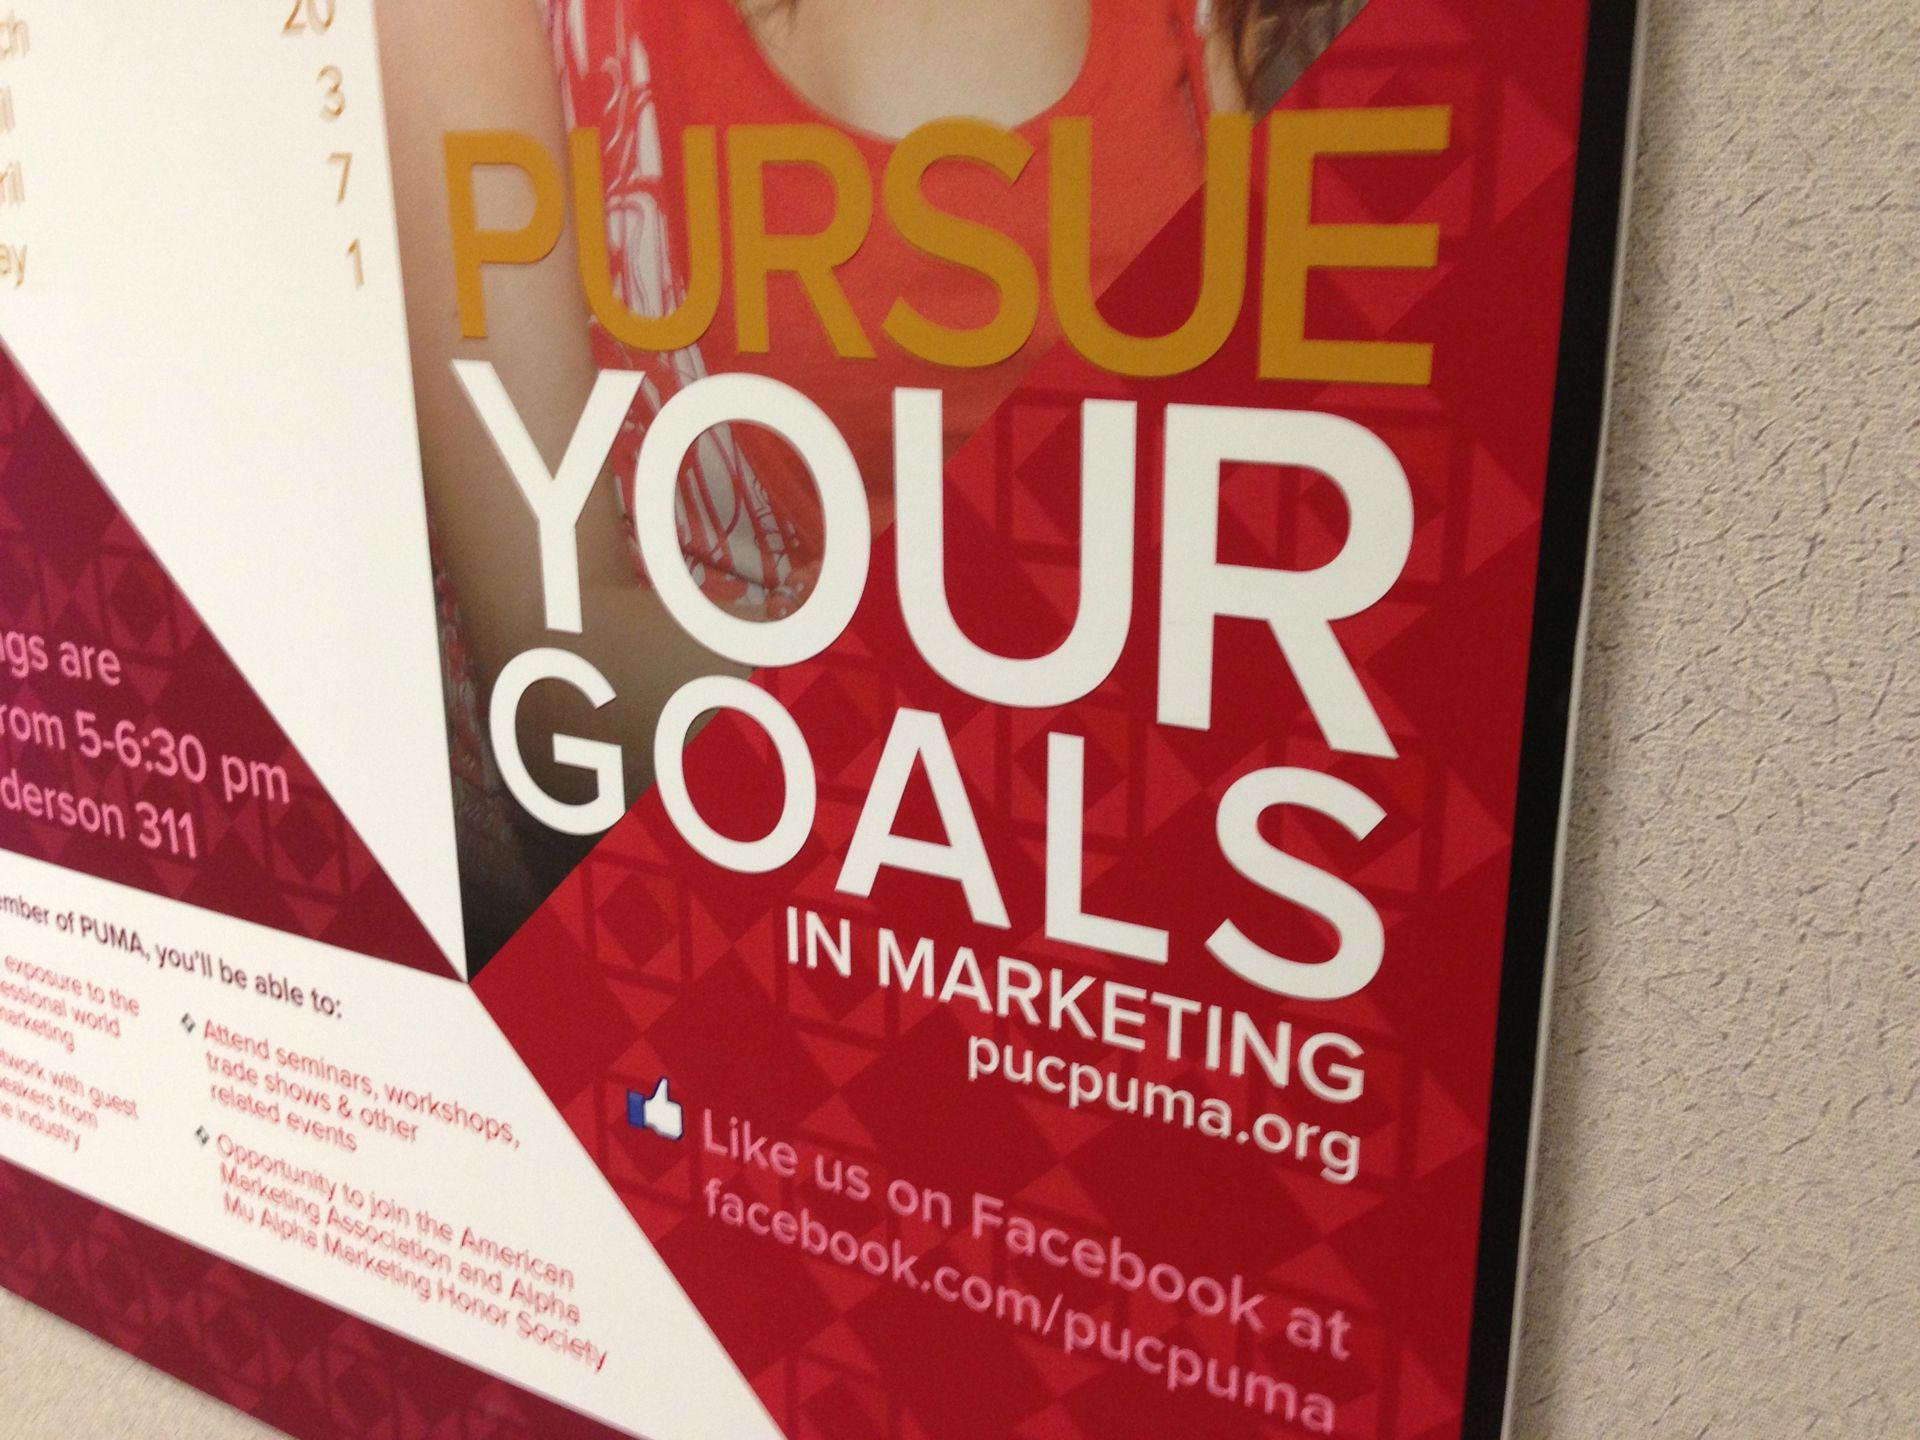 Purdue University Marketing Association - Pursue Your Goals in Marketing